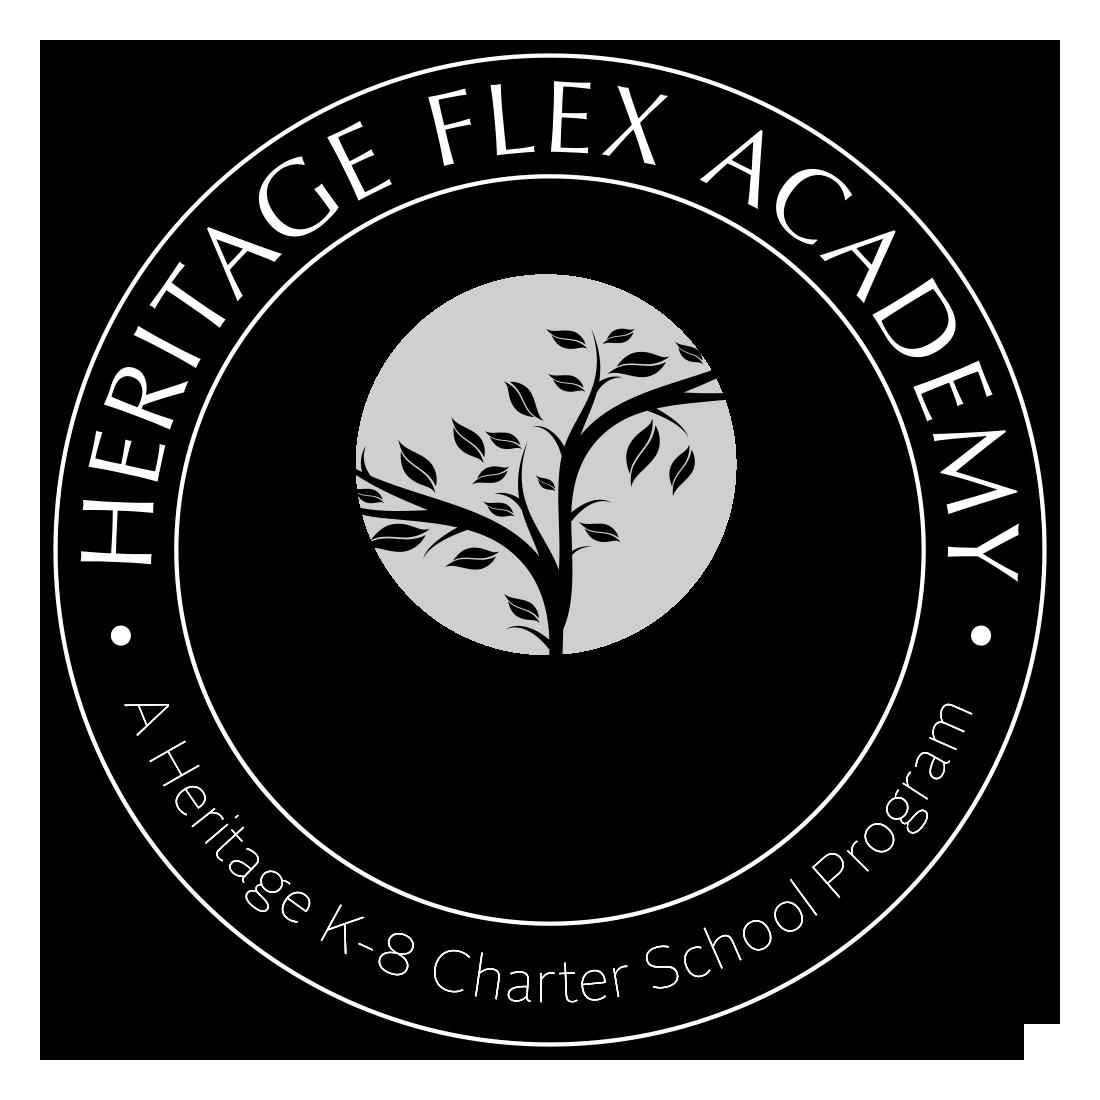 Heritage Flex Academy